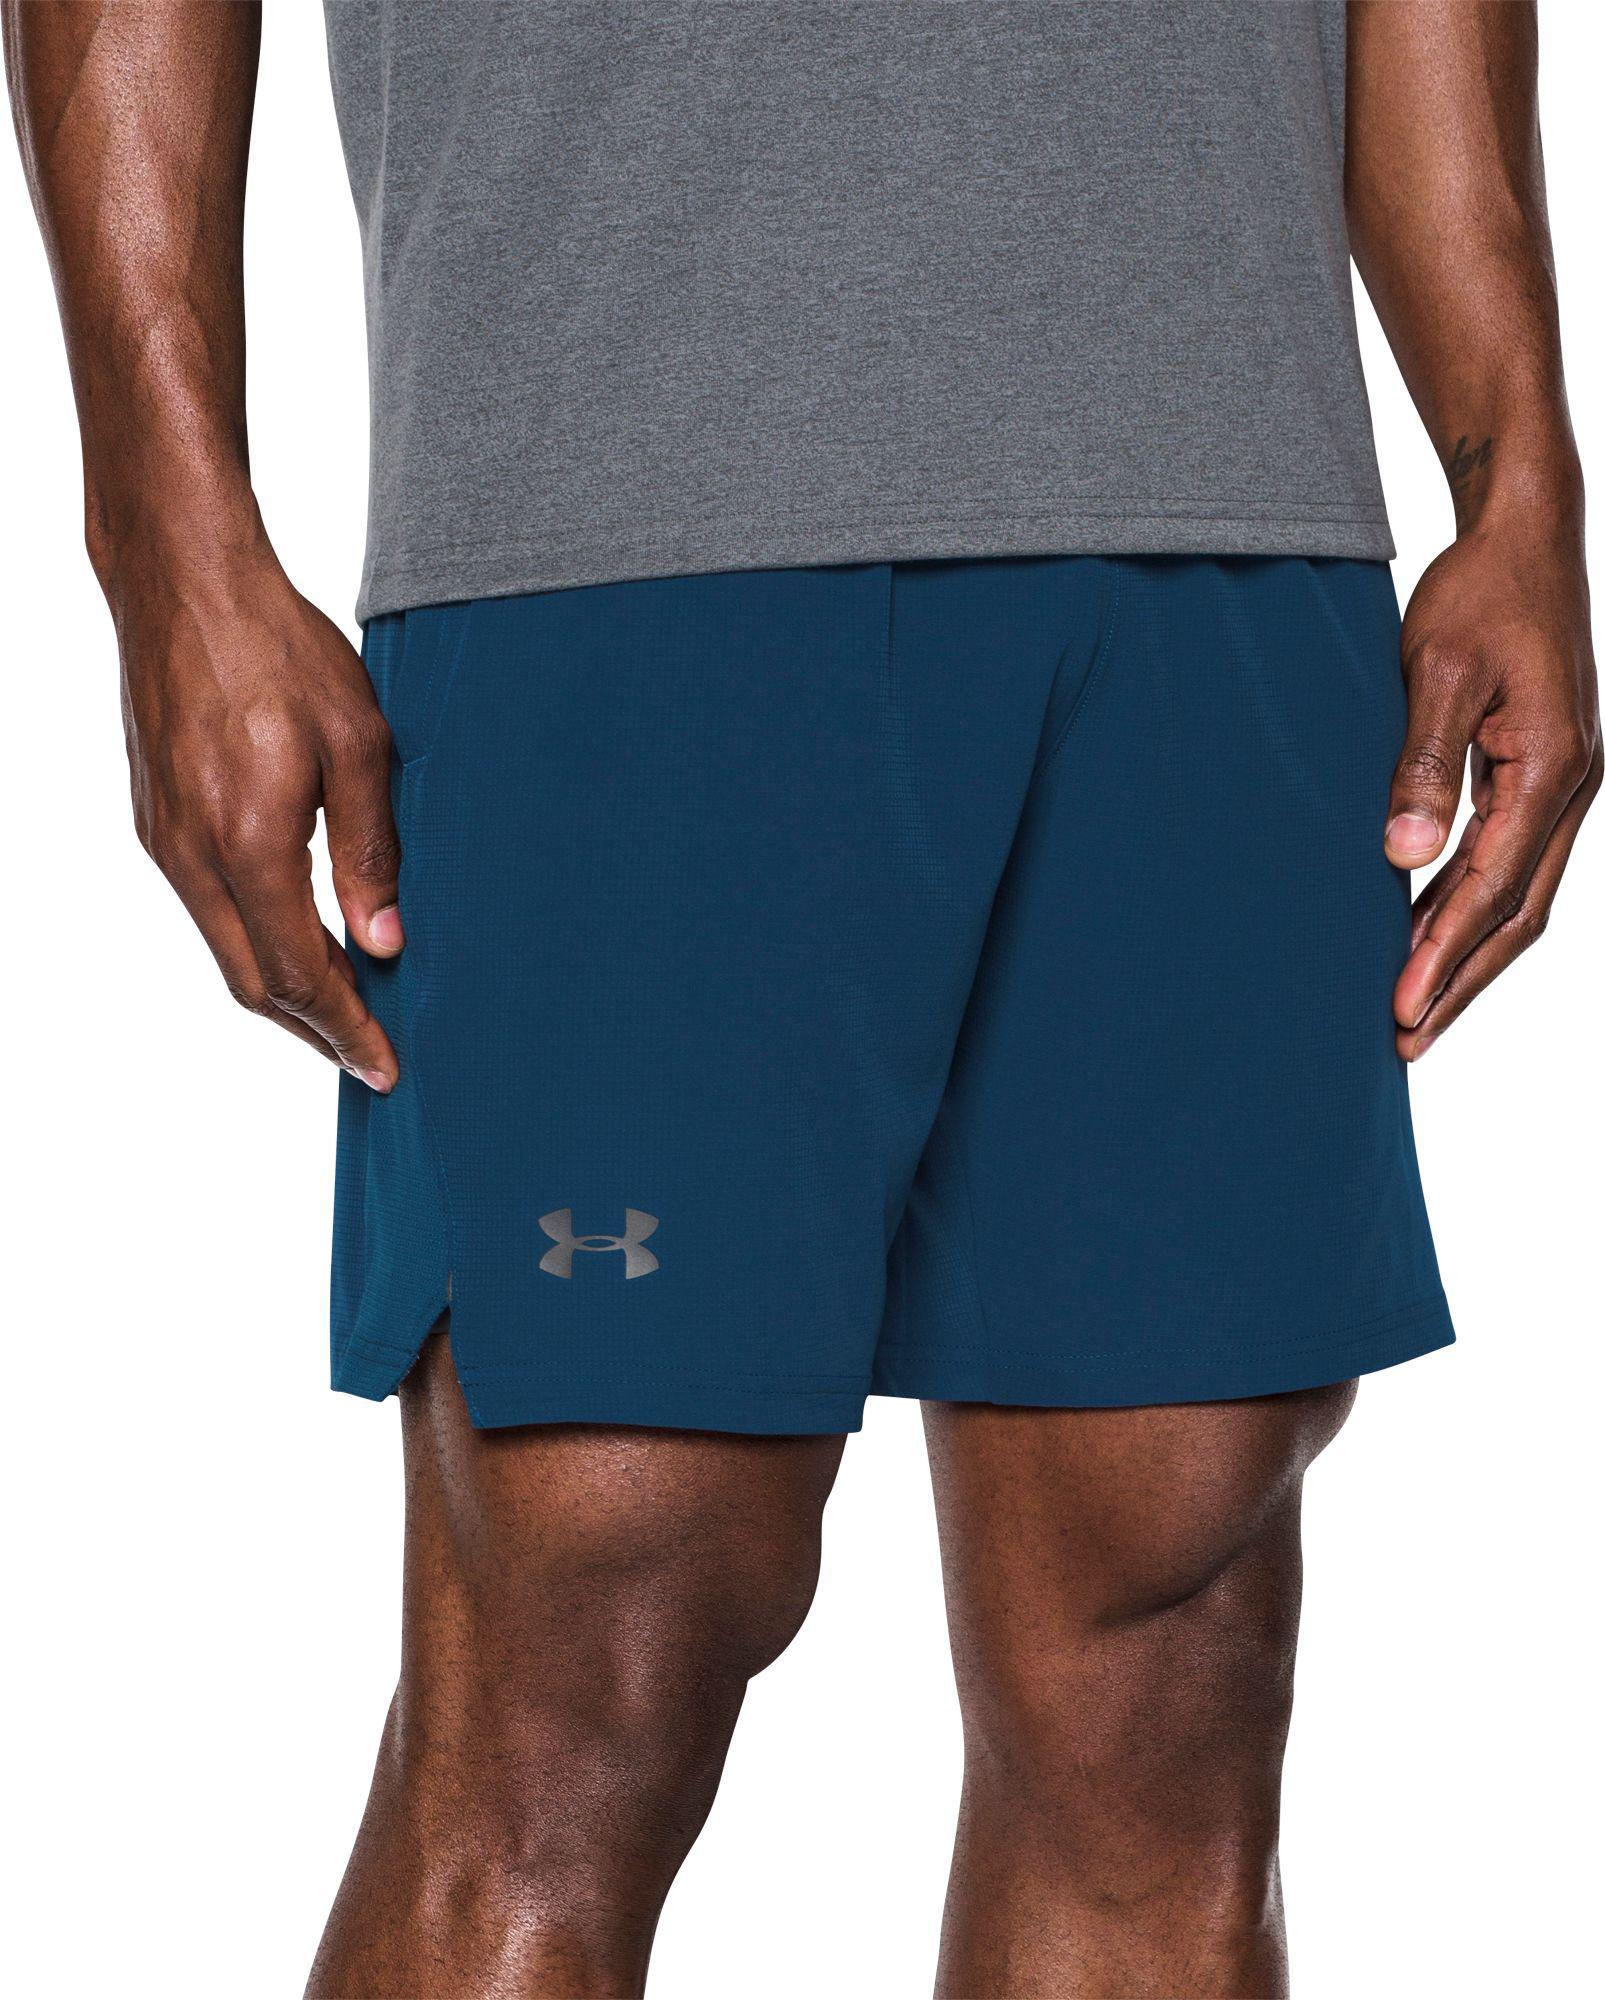 Dar una vuelta influenza muestra  buy > navy blue under armour shorts, Up to 67% OFF